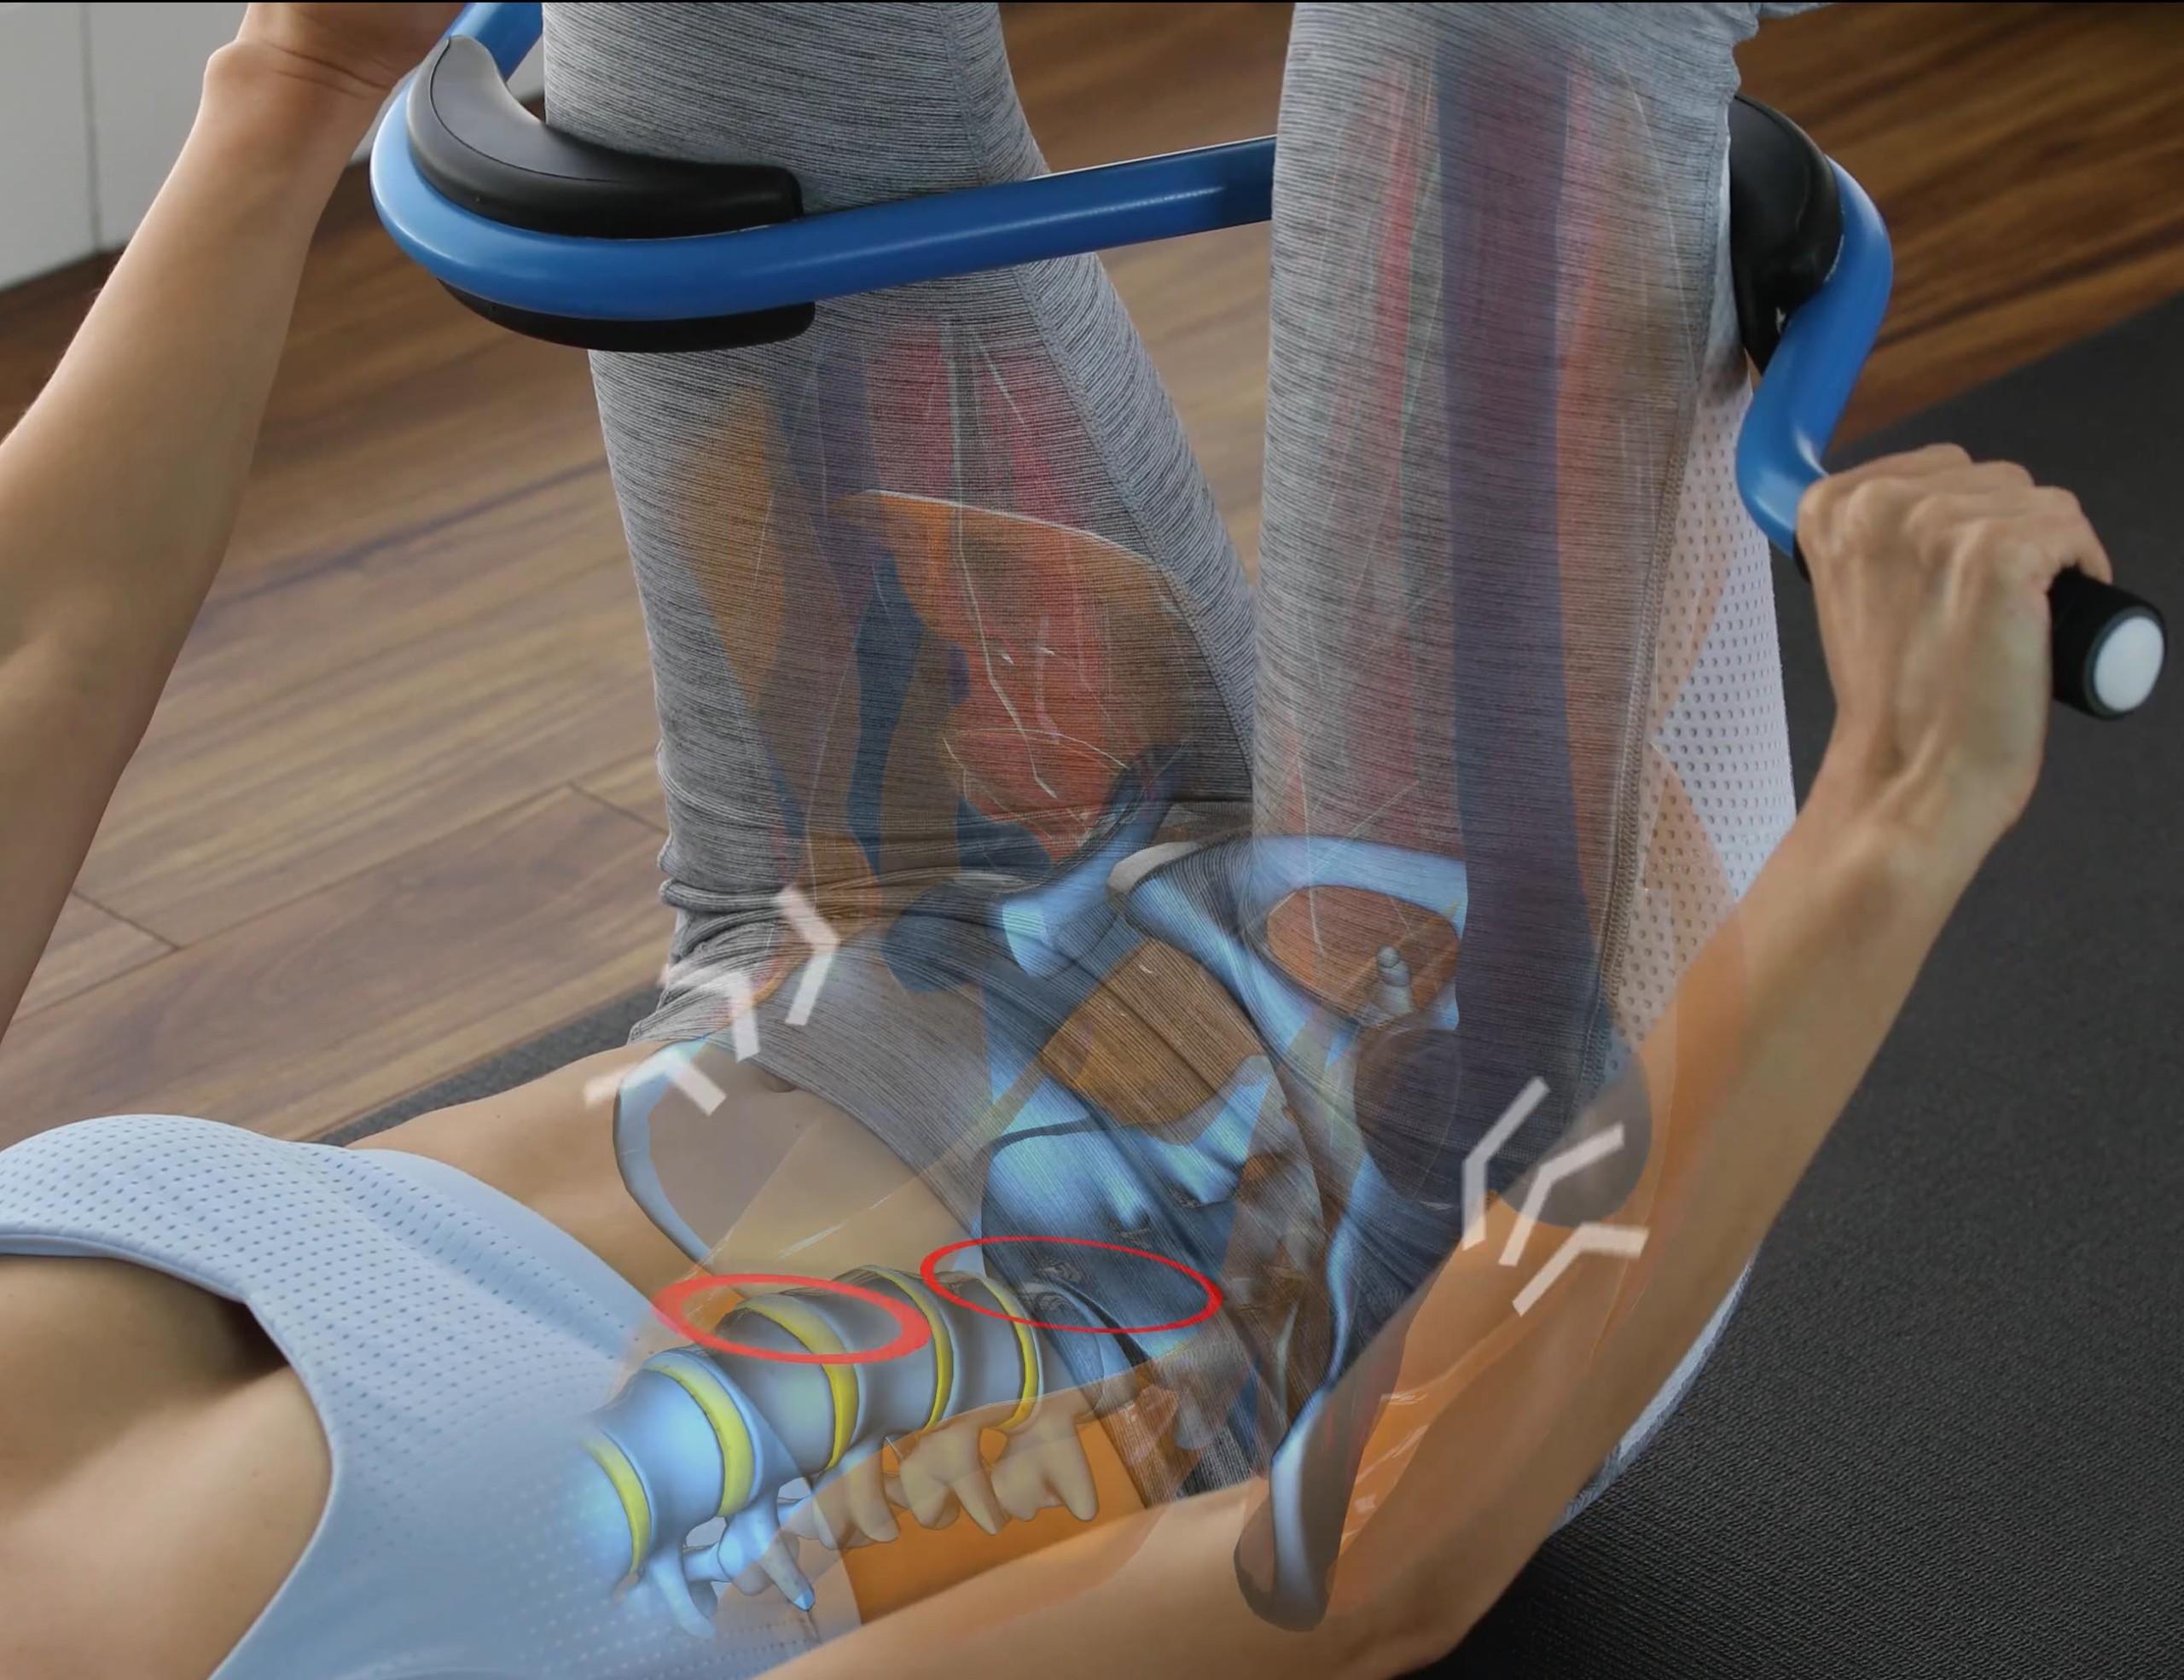 Back Pedal Smart Back Pain Device